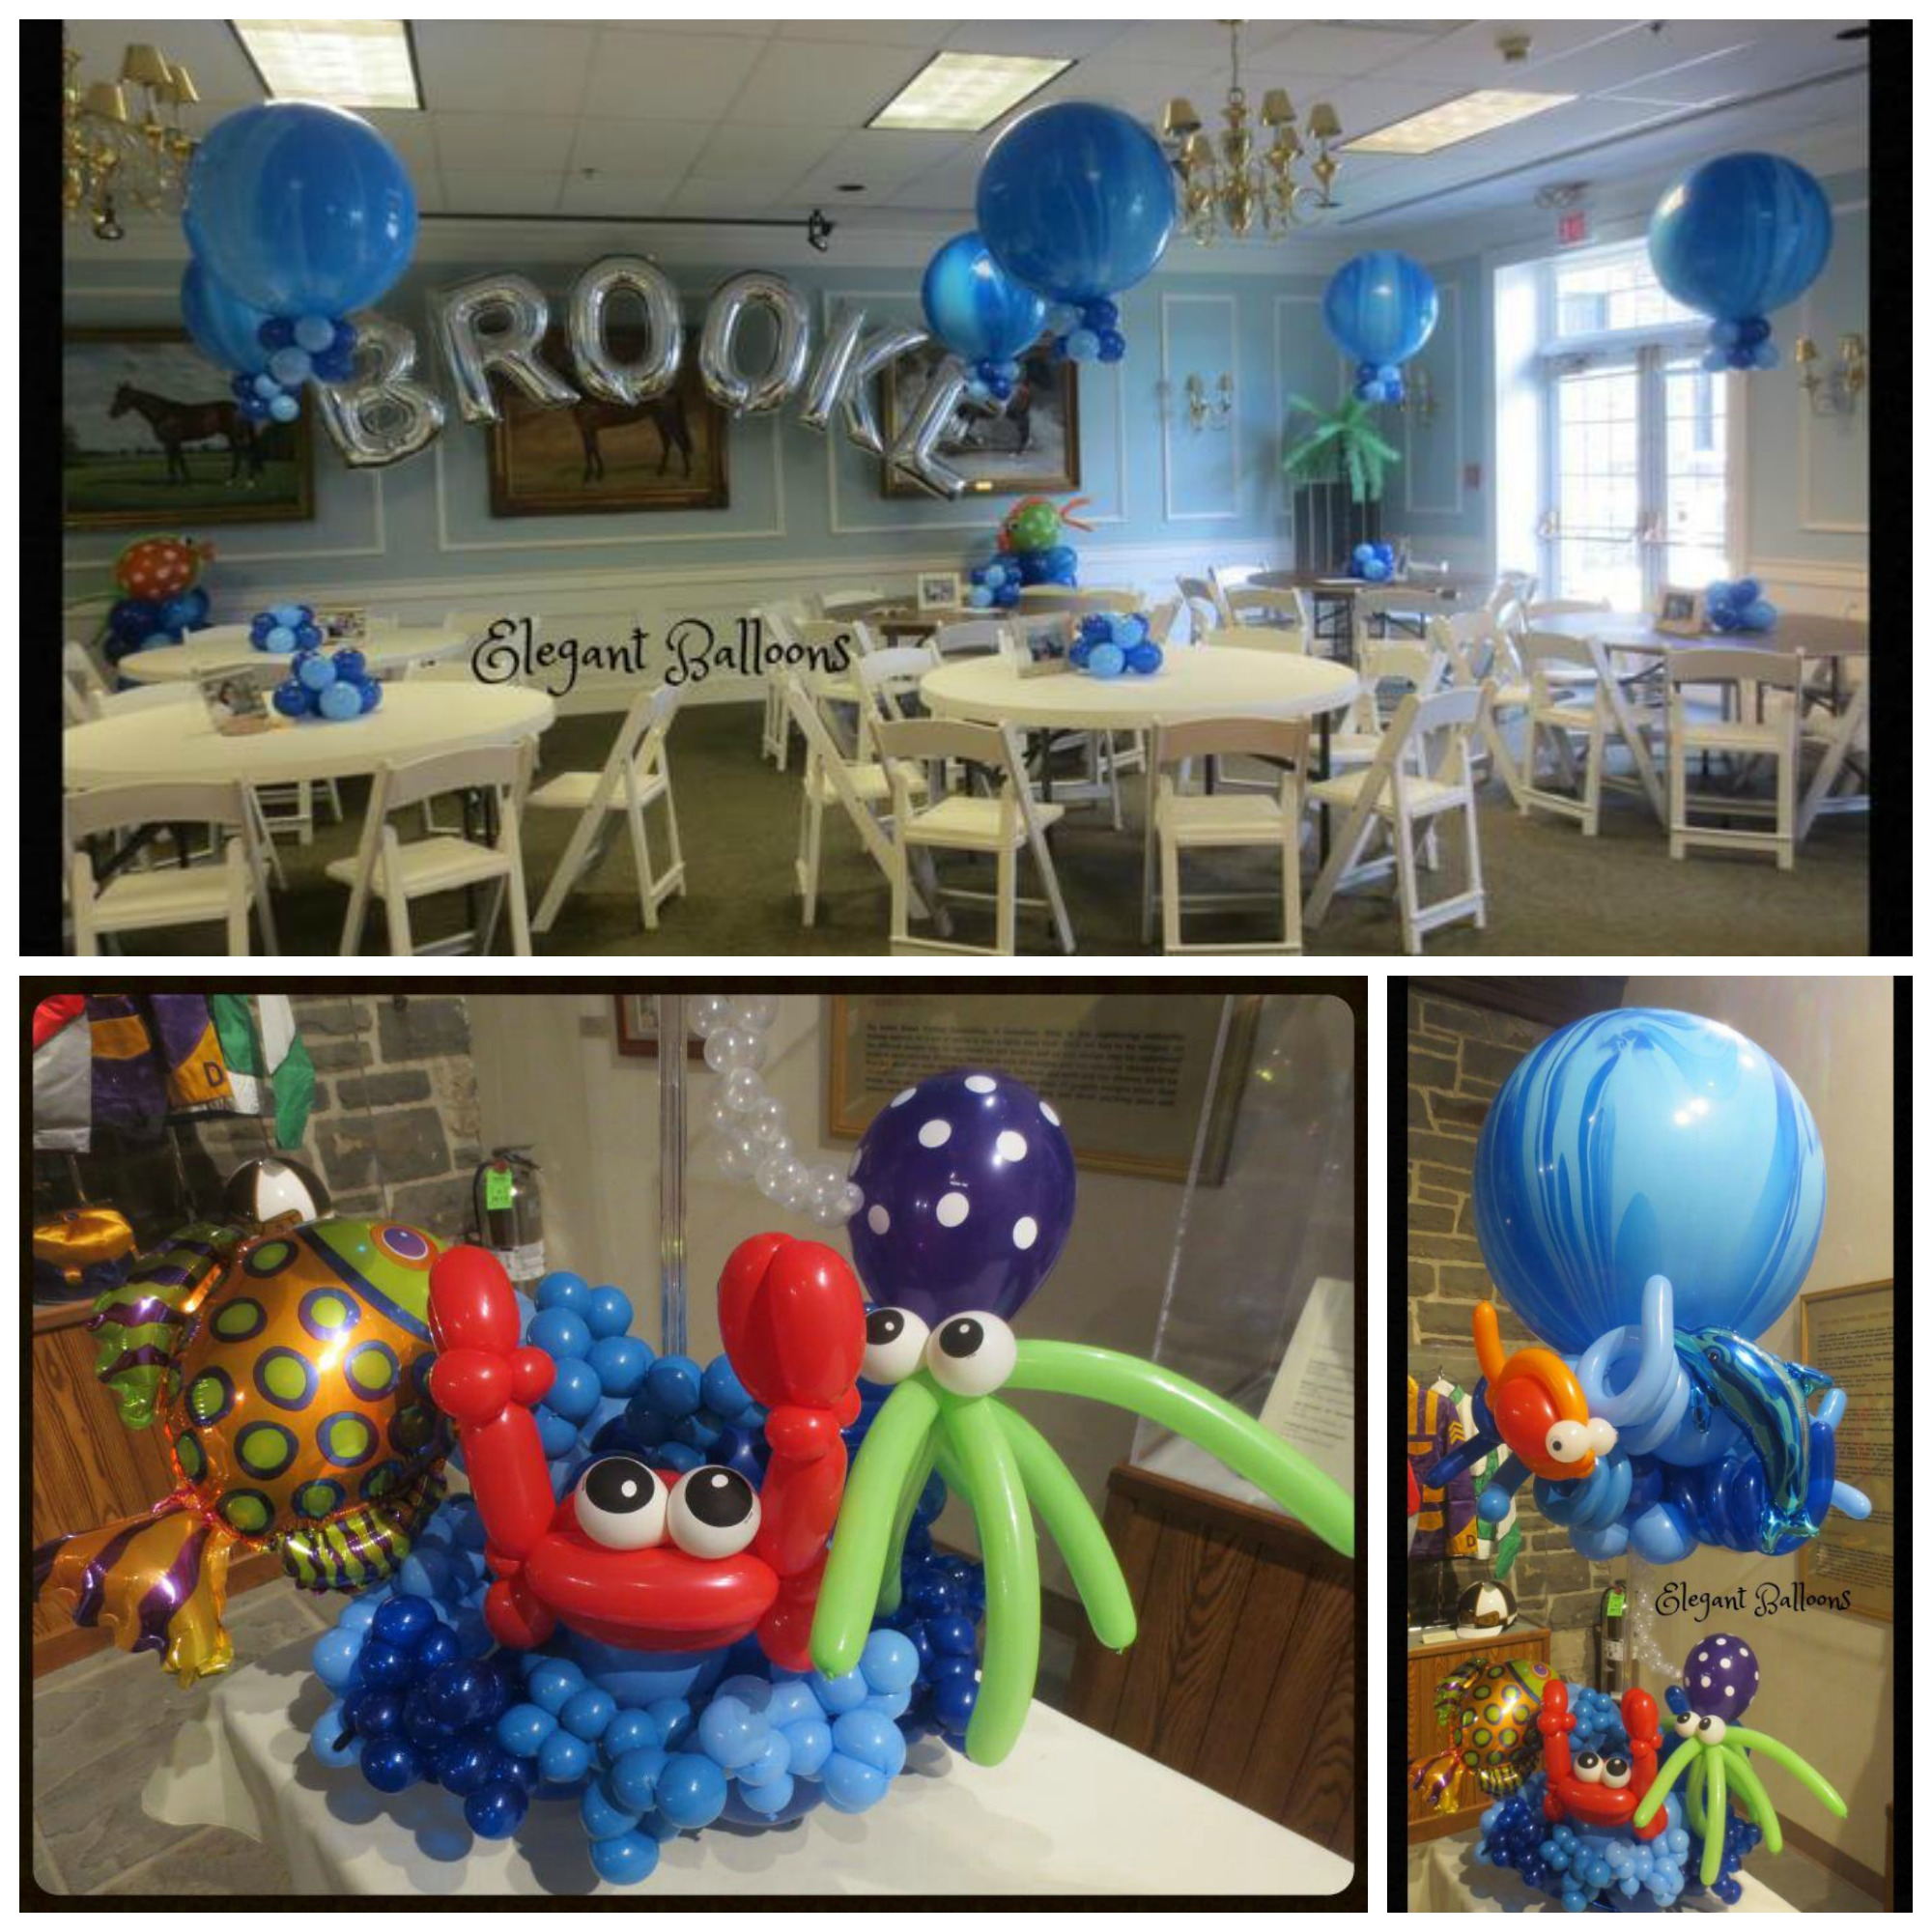 Brooke's Under the Sea